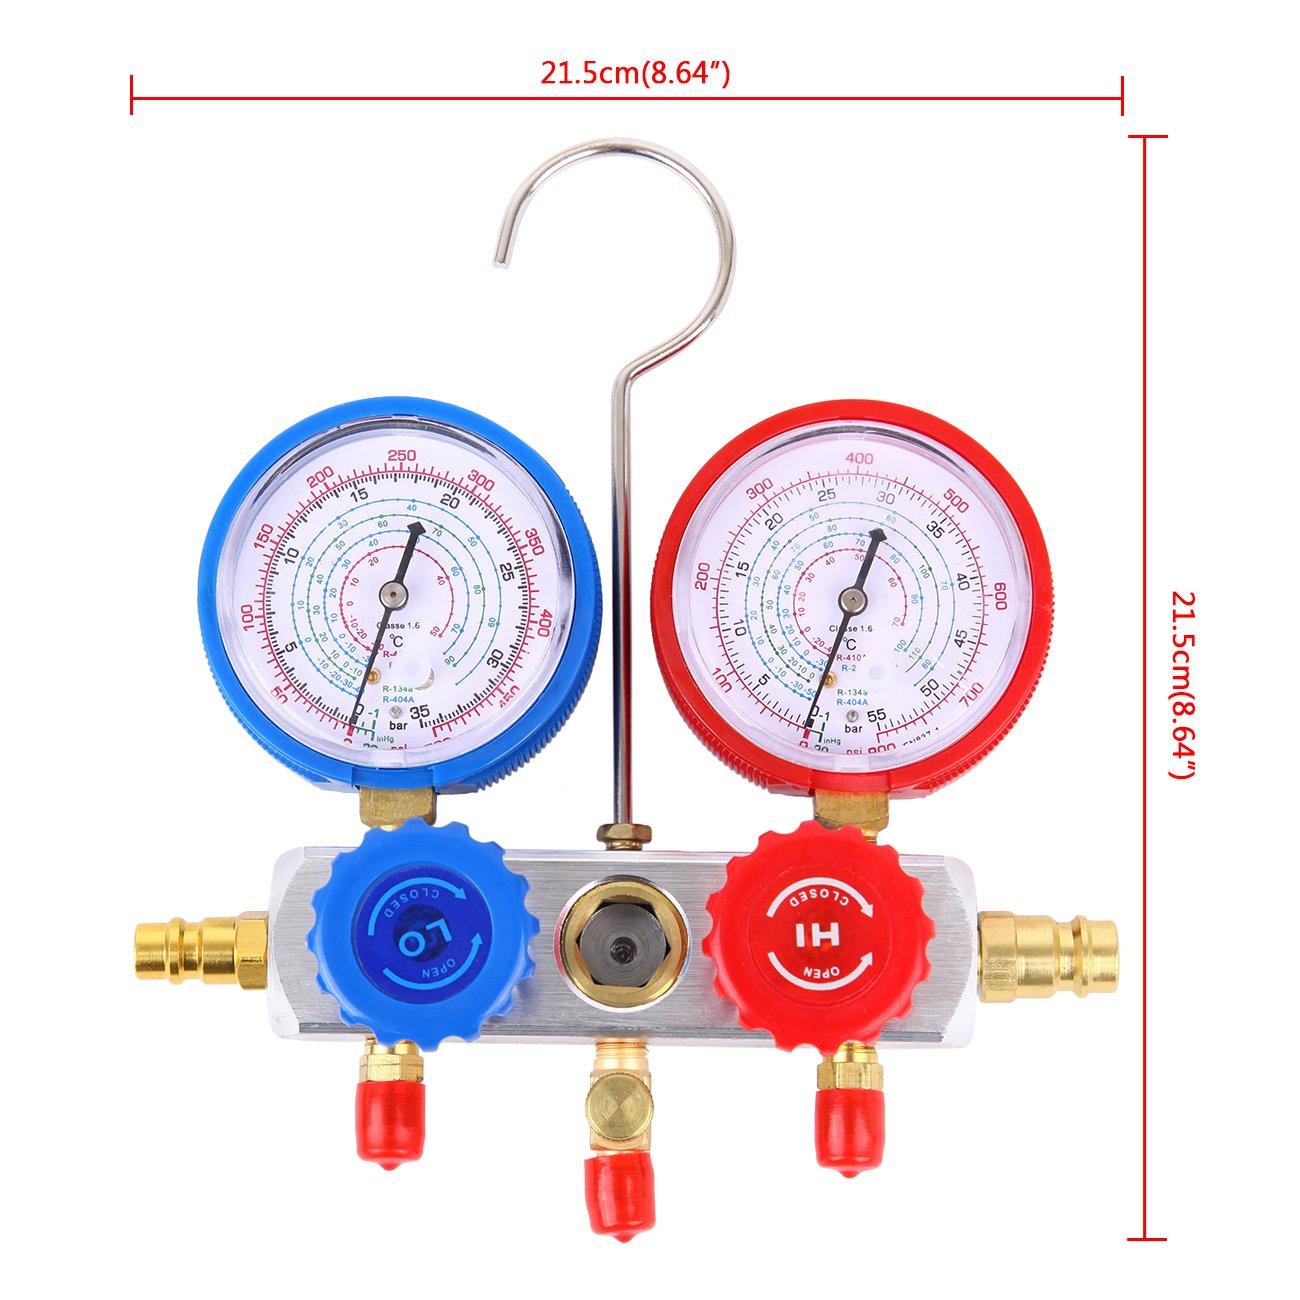 Honhill R134a R22 R410a R404a AC Refrigeration Kit A//C Condizionatore manometro